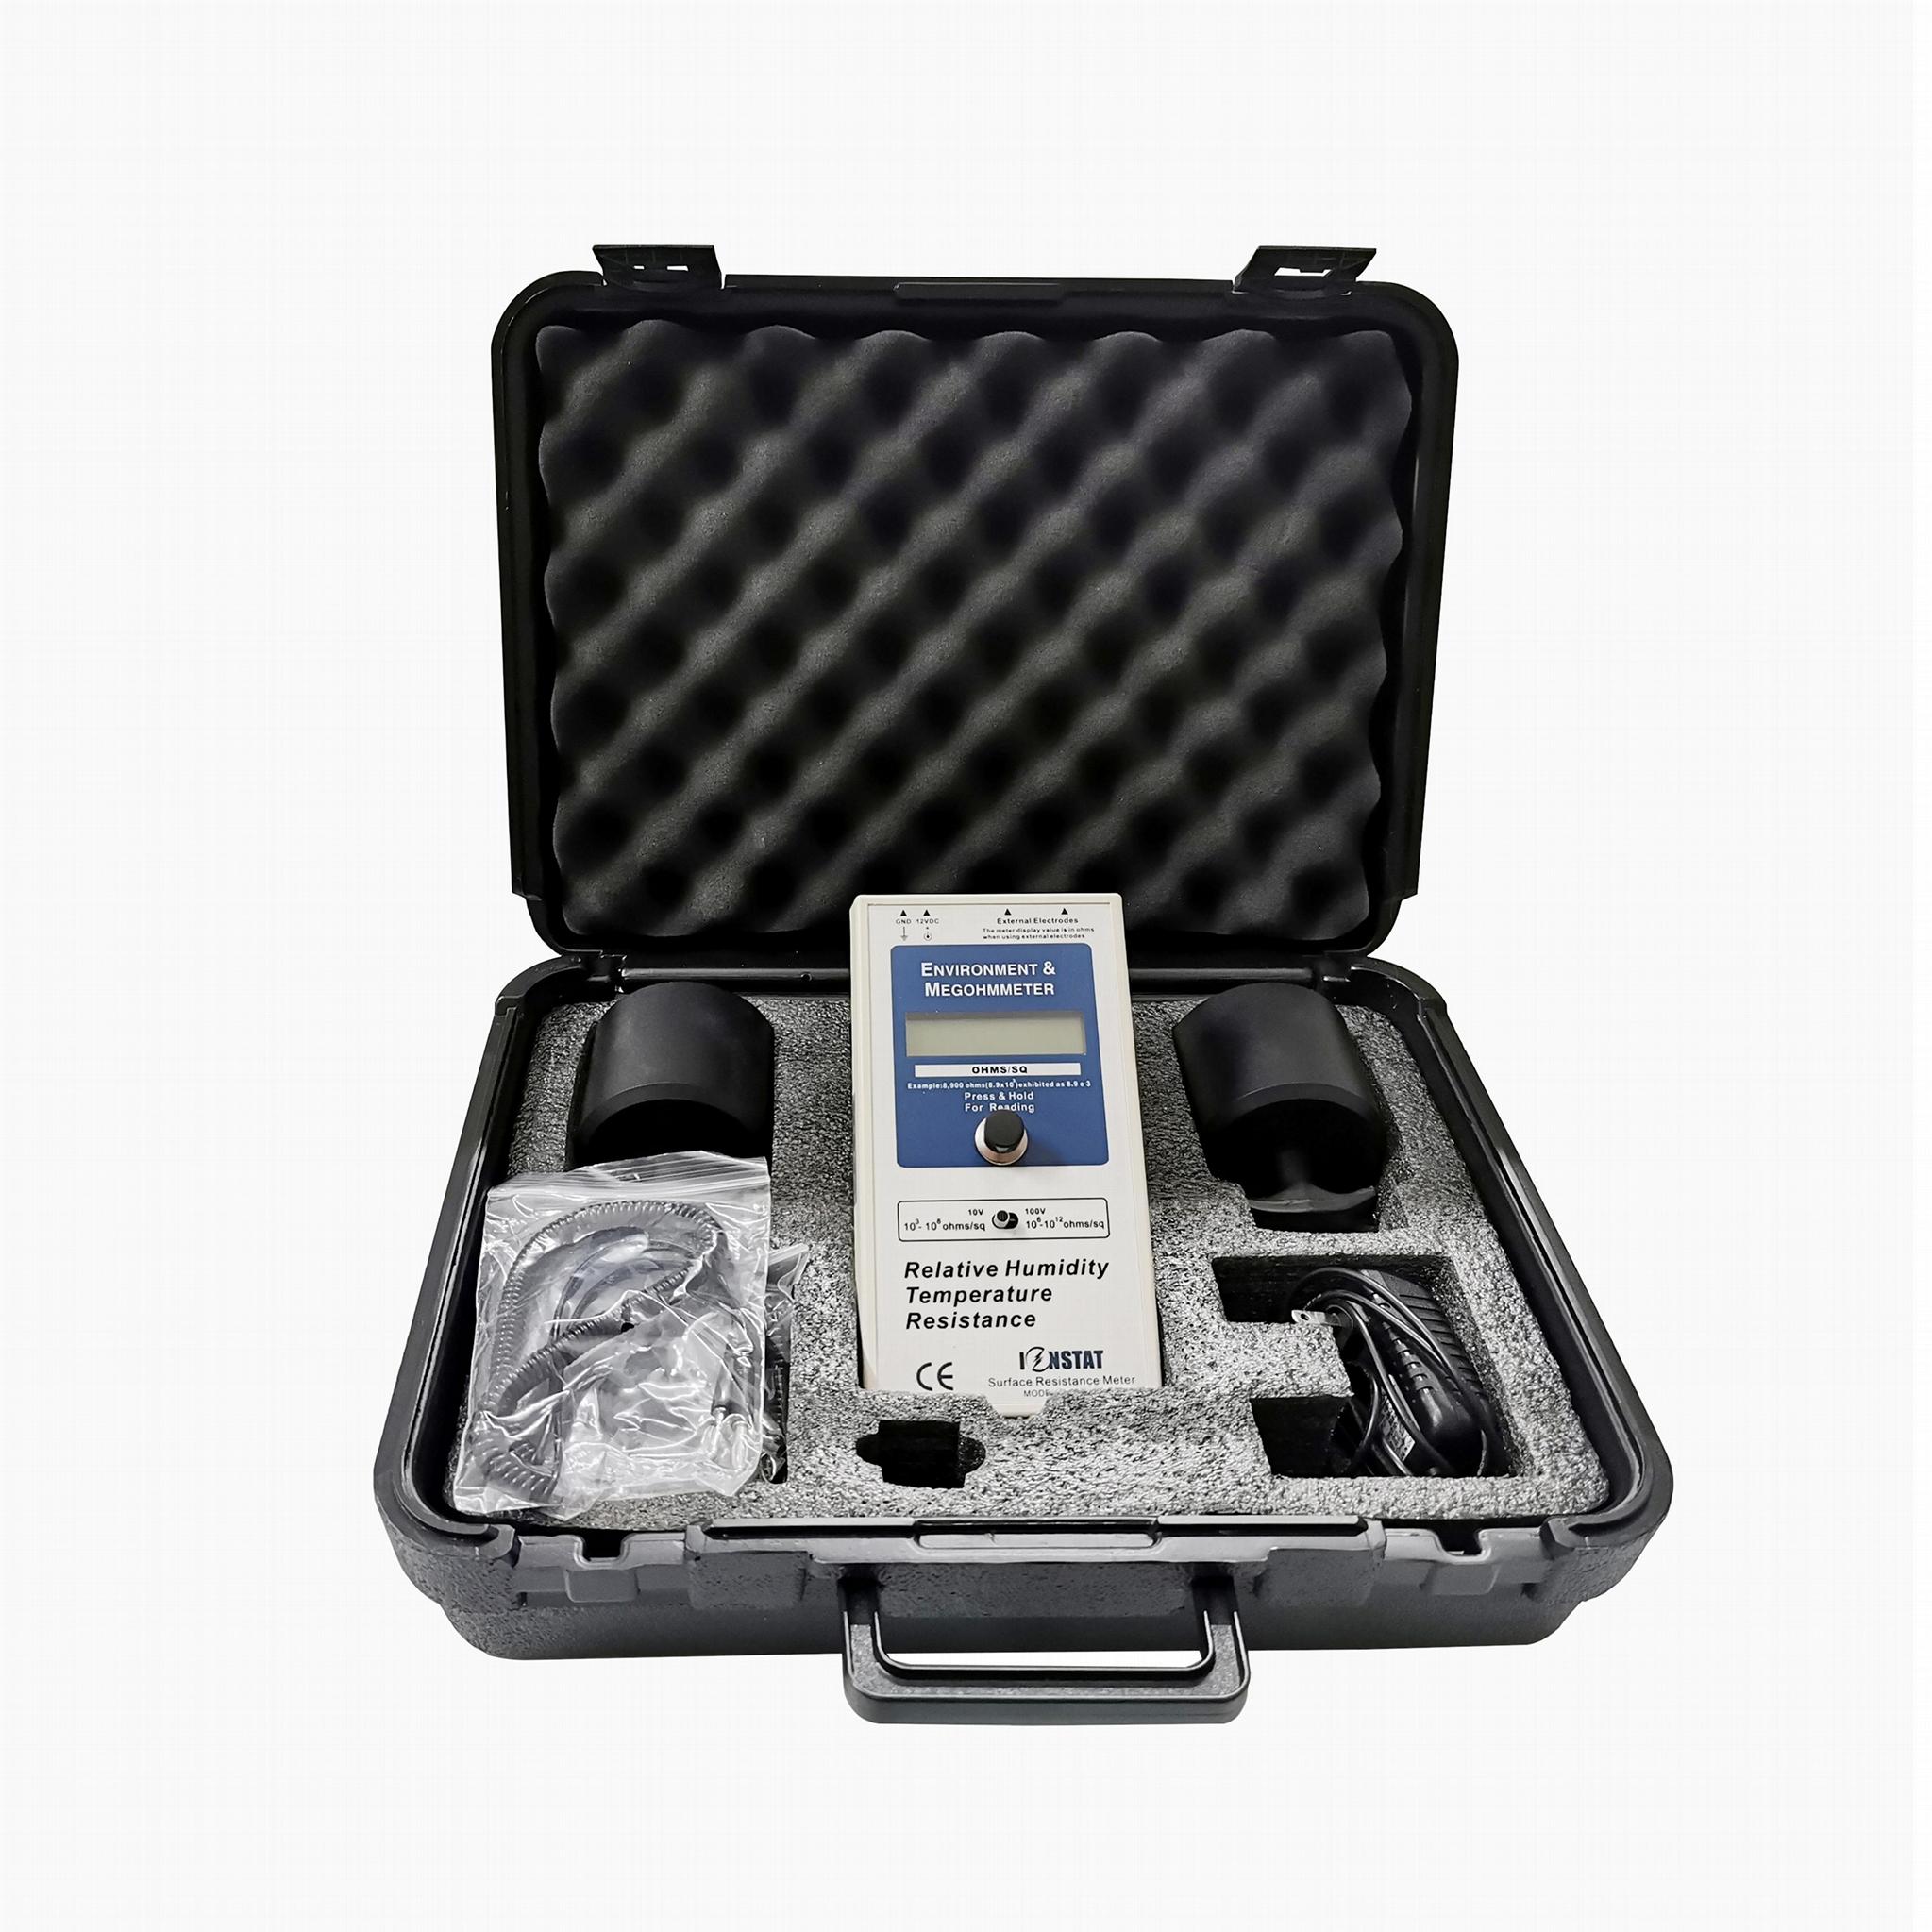 CE Approved SJC-030B E-HST002 Hammer type Surface resistance meter 2